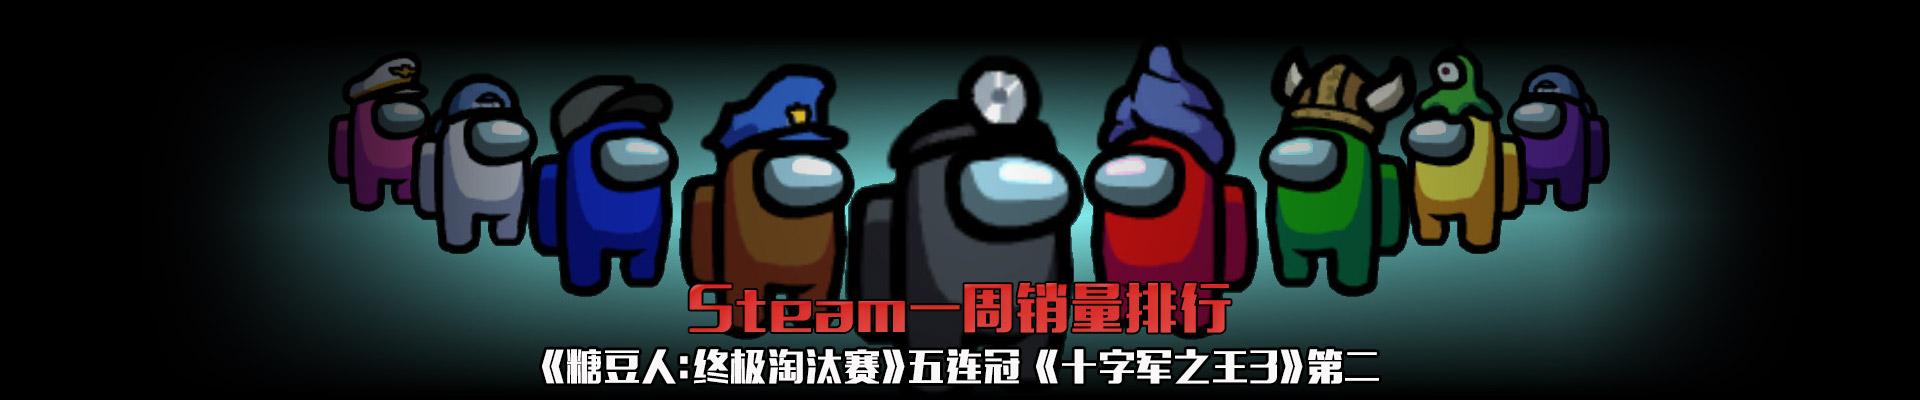 Steam周销量排行榜:《糖豆人:终极淘汰赛》六连冠 《Among US》第二